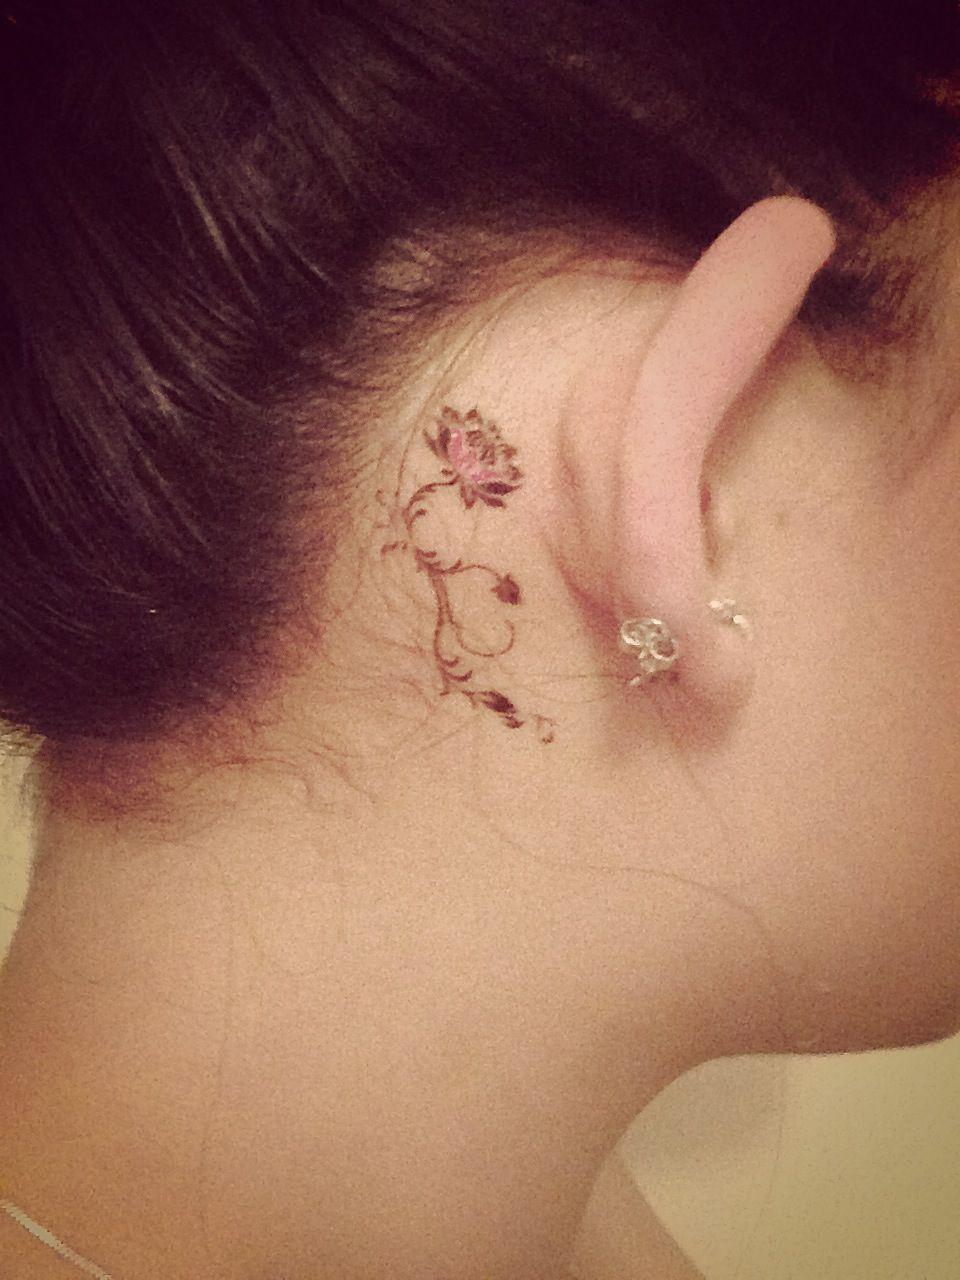 Flower tattoo behind ear dainty tattoo pinterest for Dainty flower tattoos